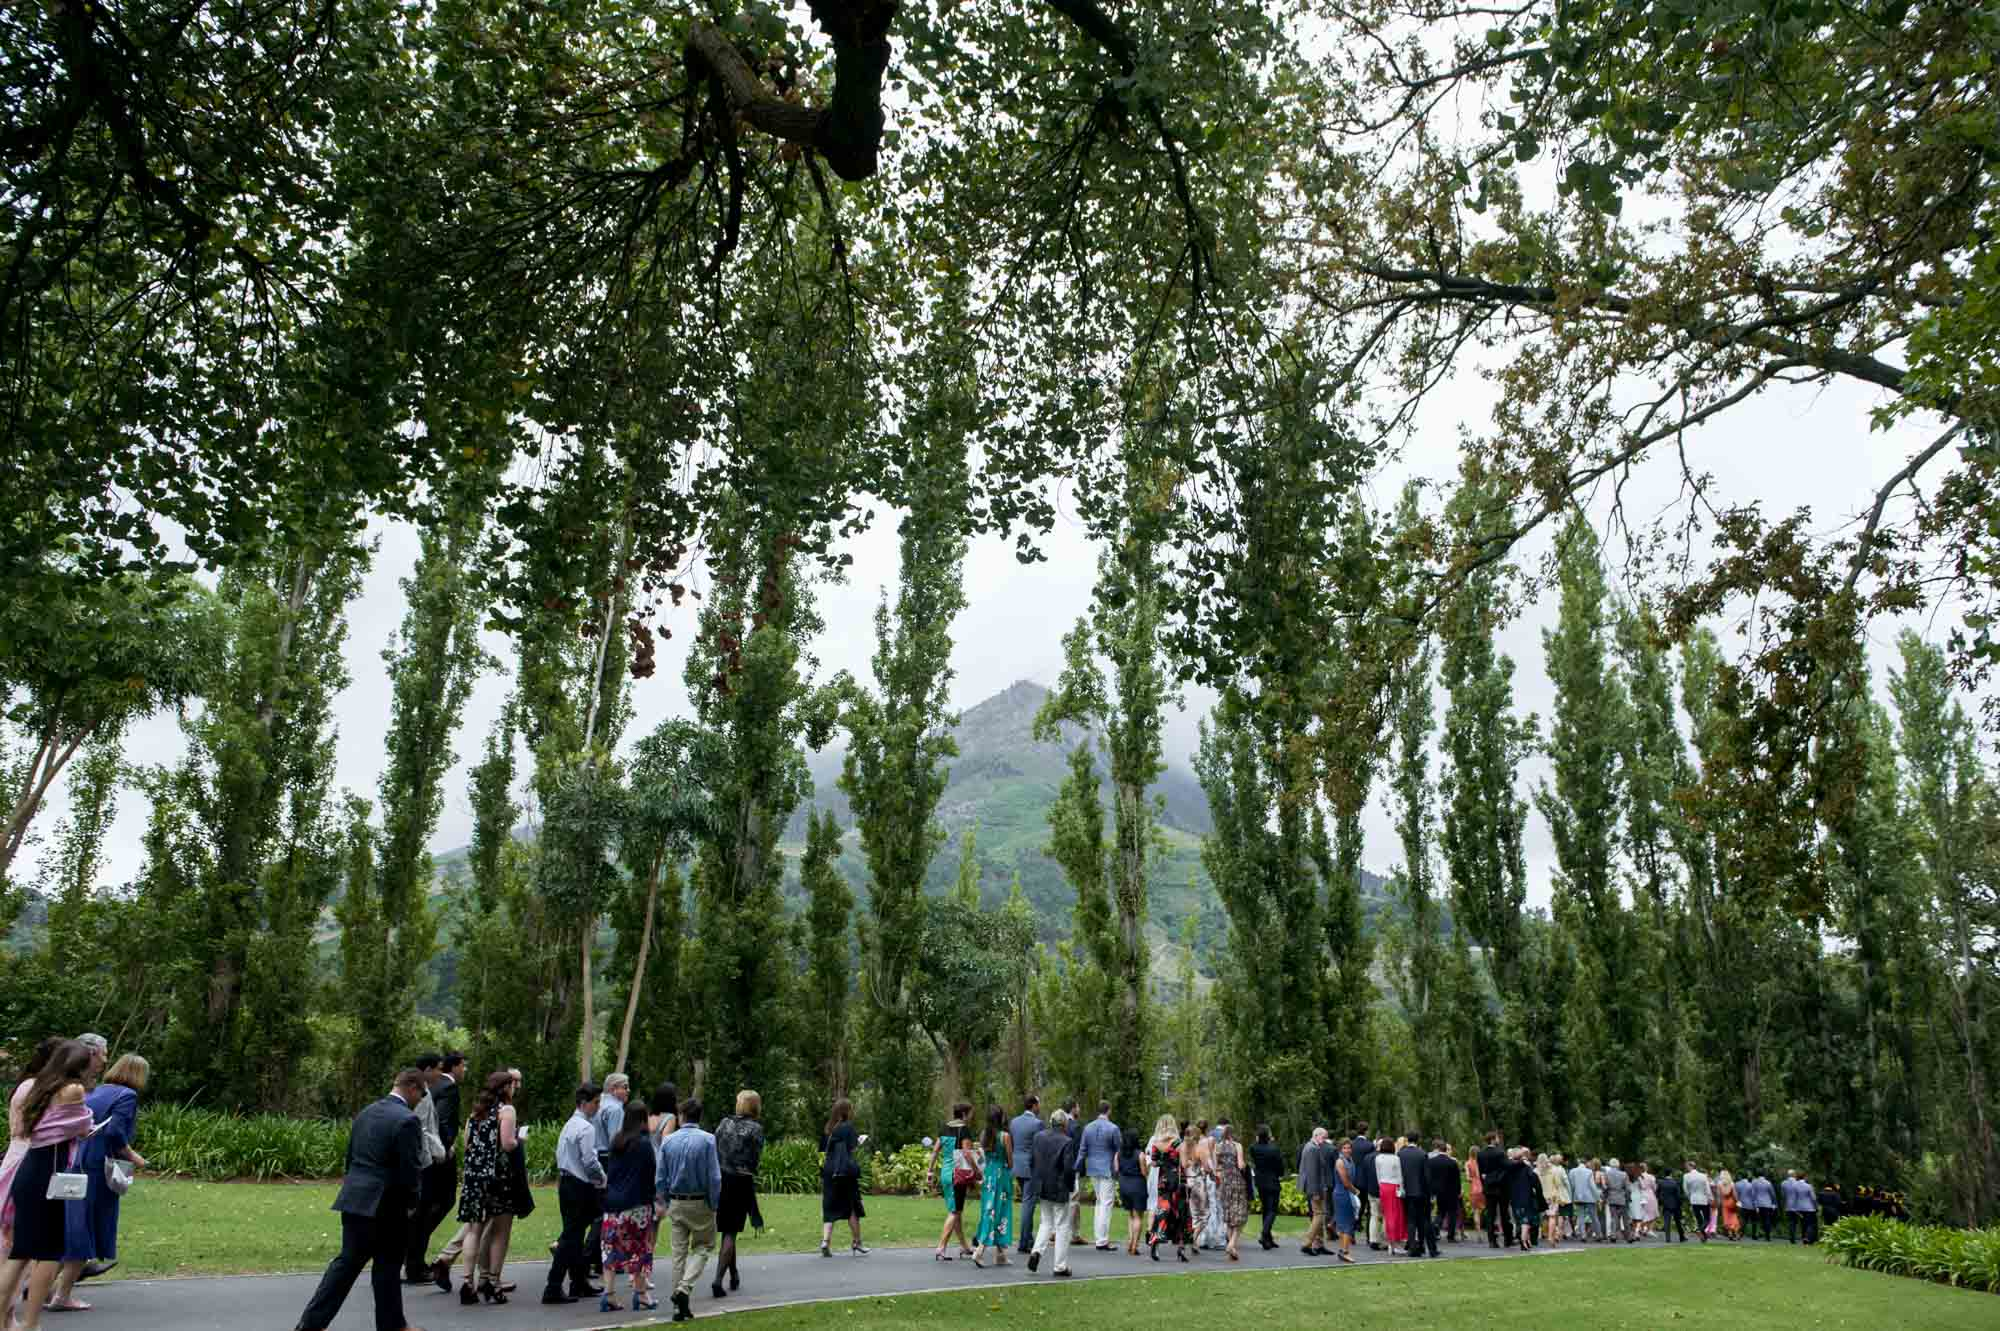 john-henry-cape-town-wedding-photographer-ceremony-001-11.jpg